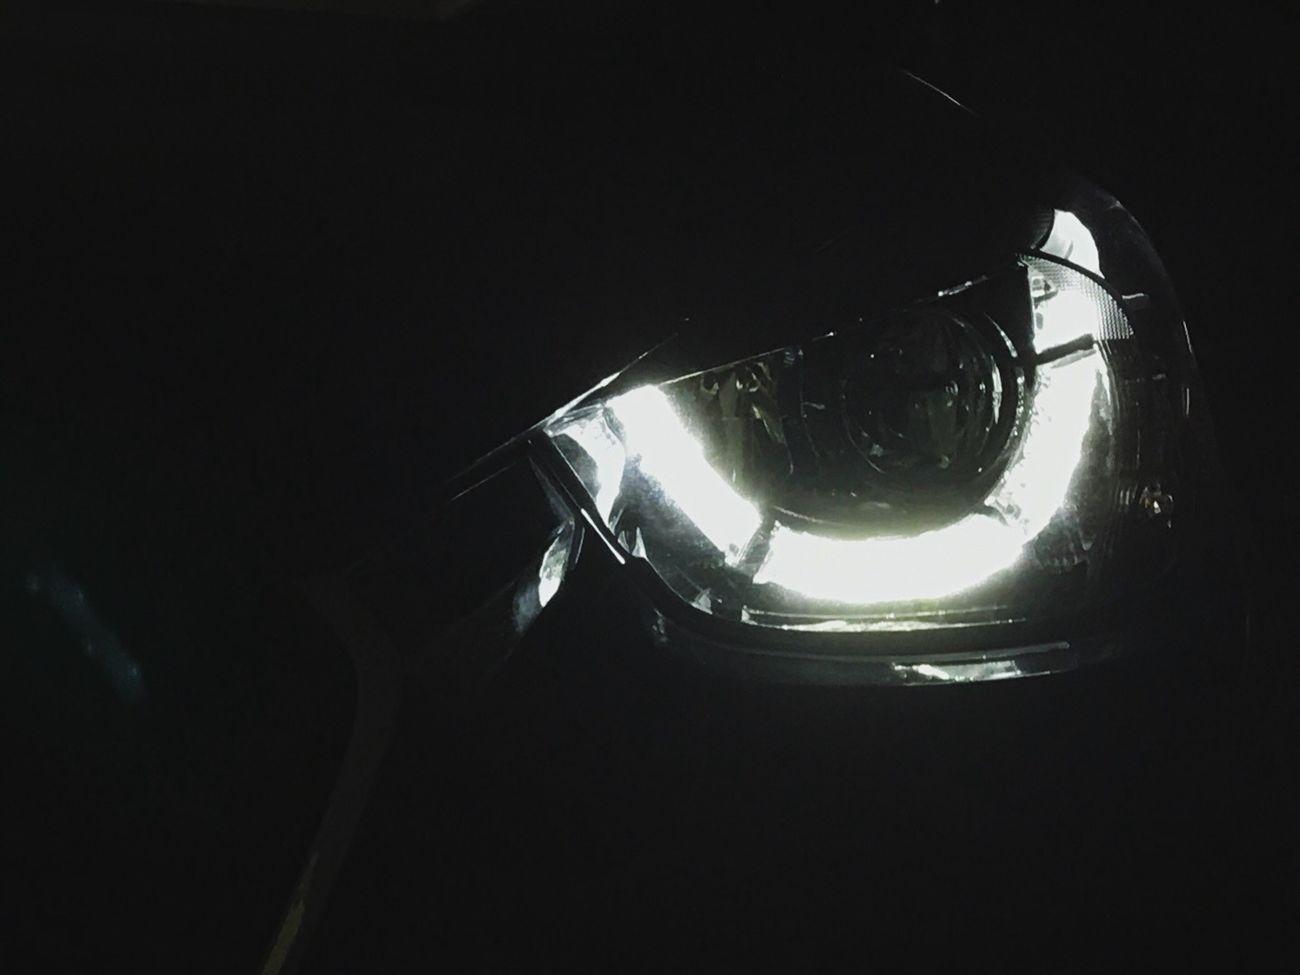 Shot with iPhone 7+. Car Mazda Headlight Light